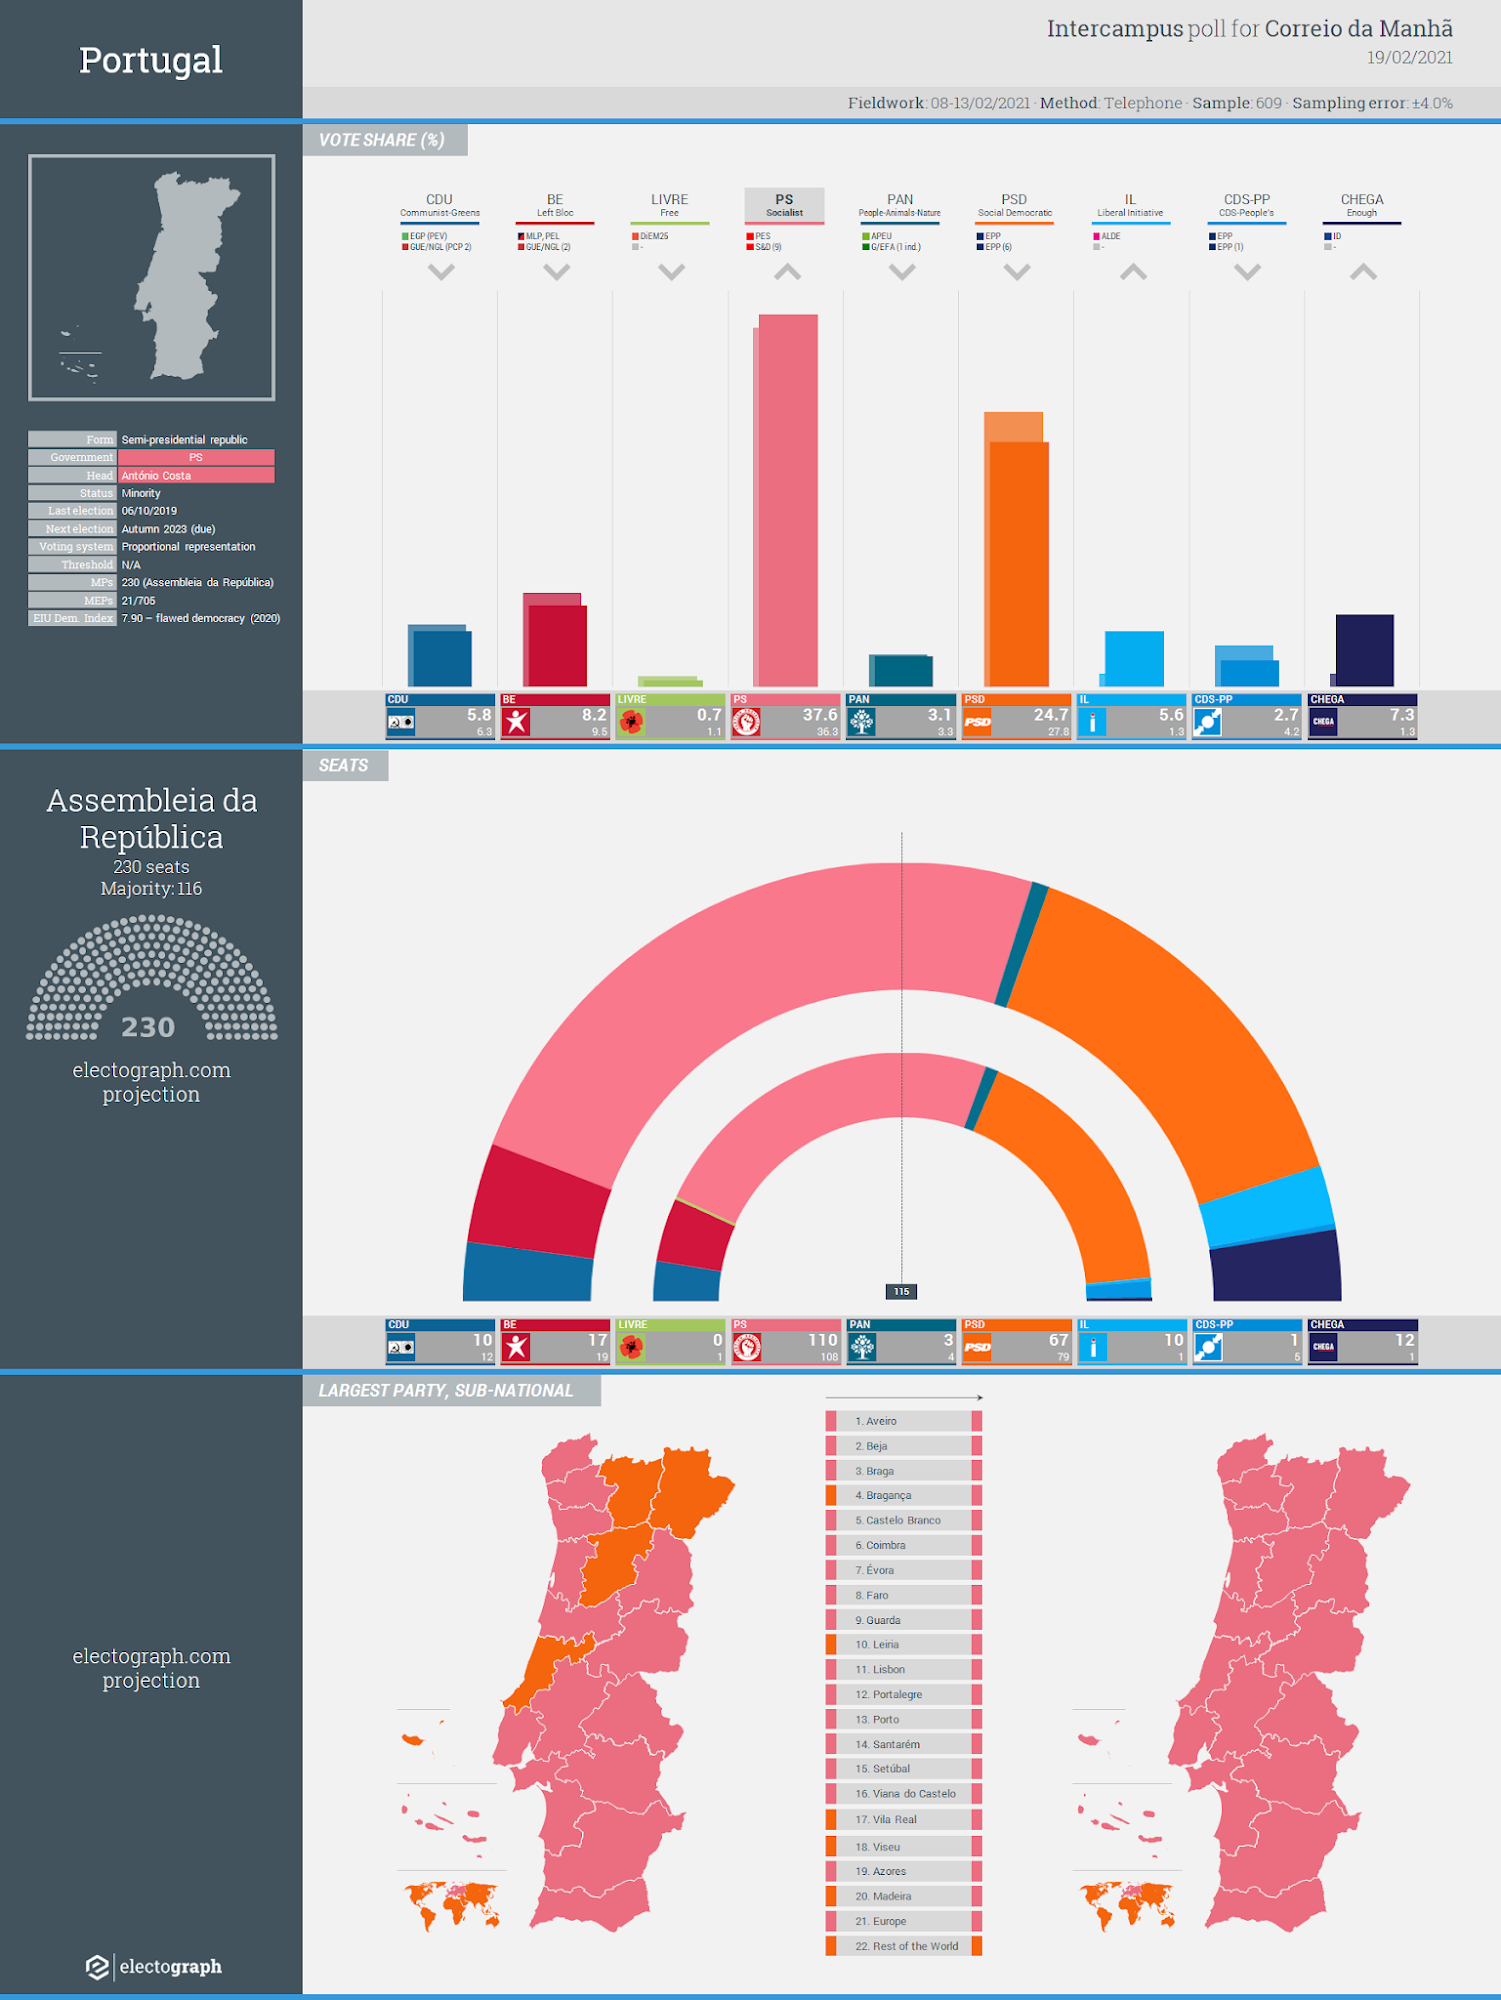 PORTUGAL: Intercampus poll chart for Correio da Manhã, 19 February 2021